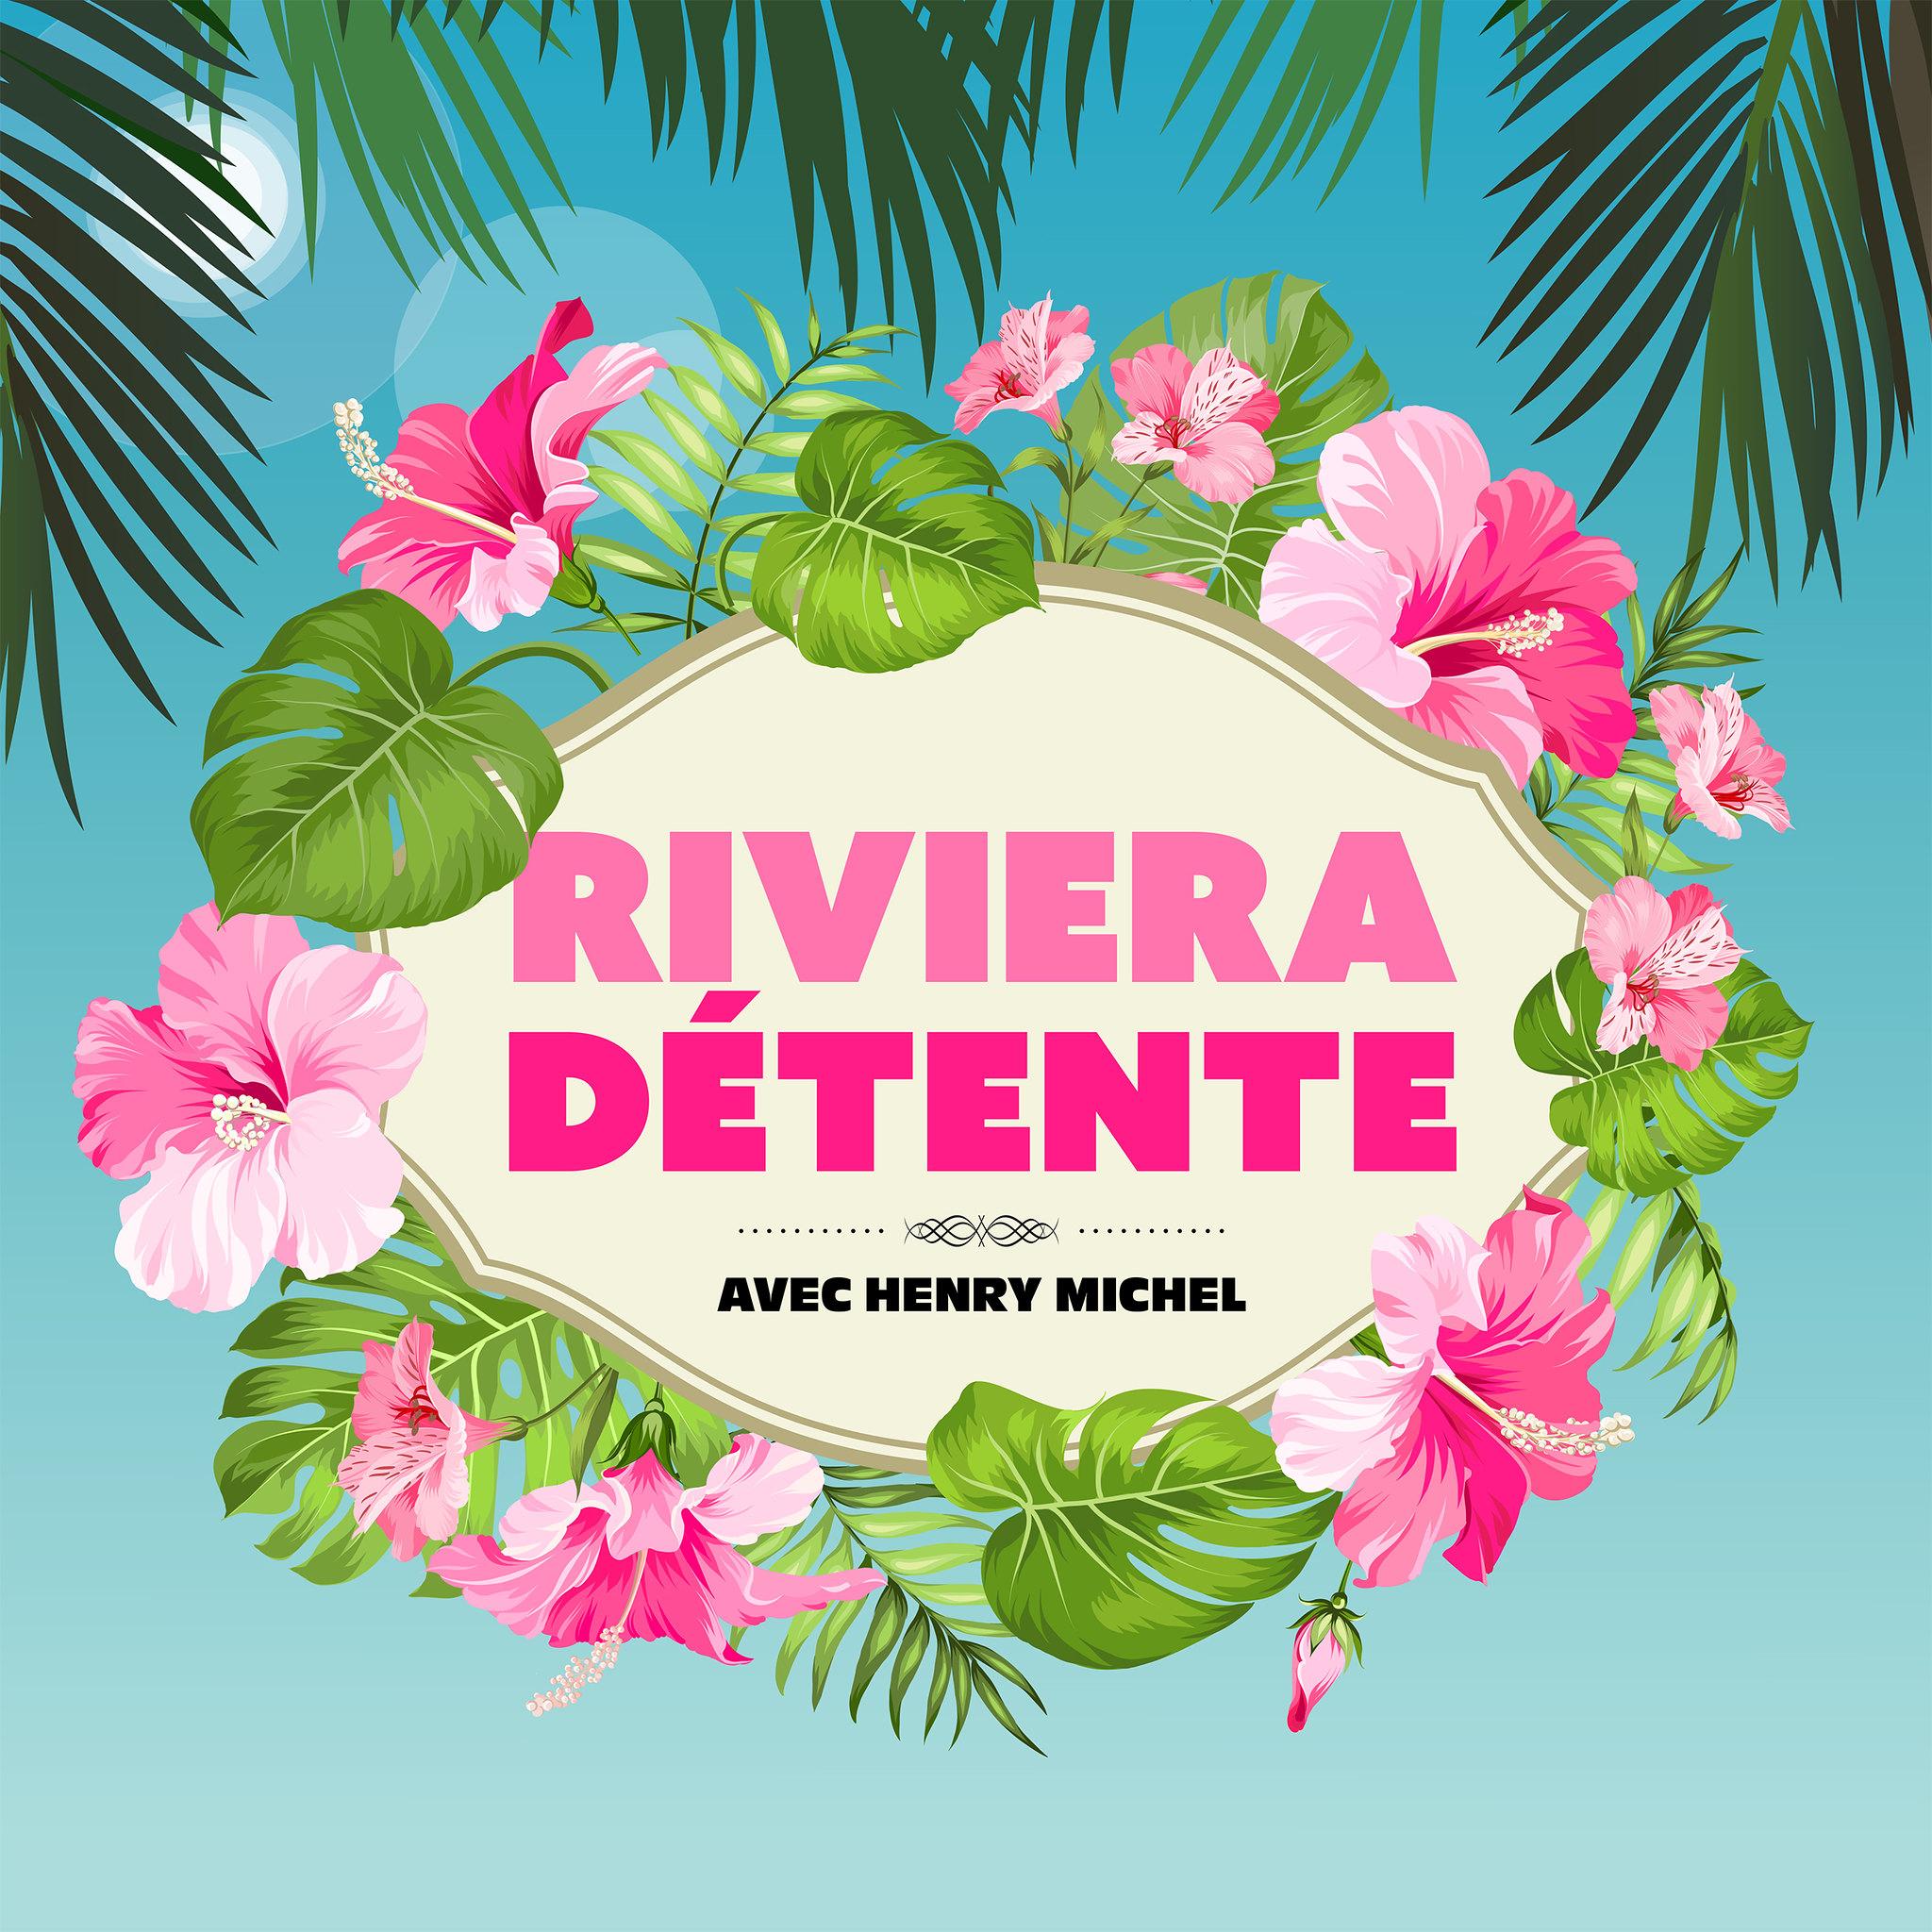 Riviera Detente